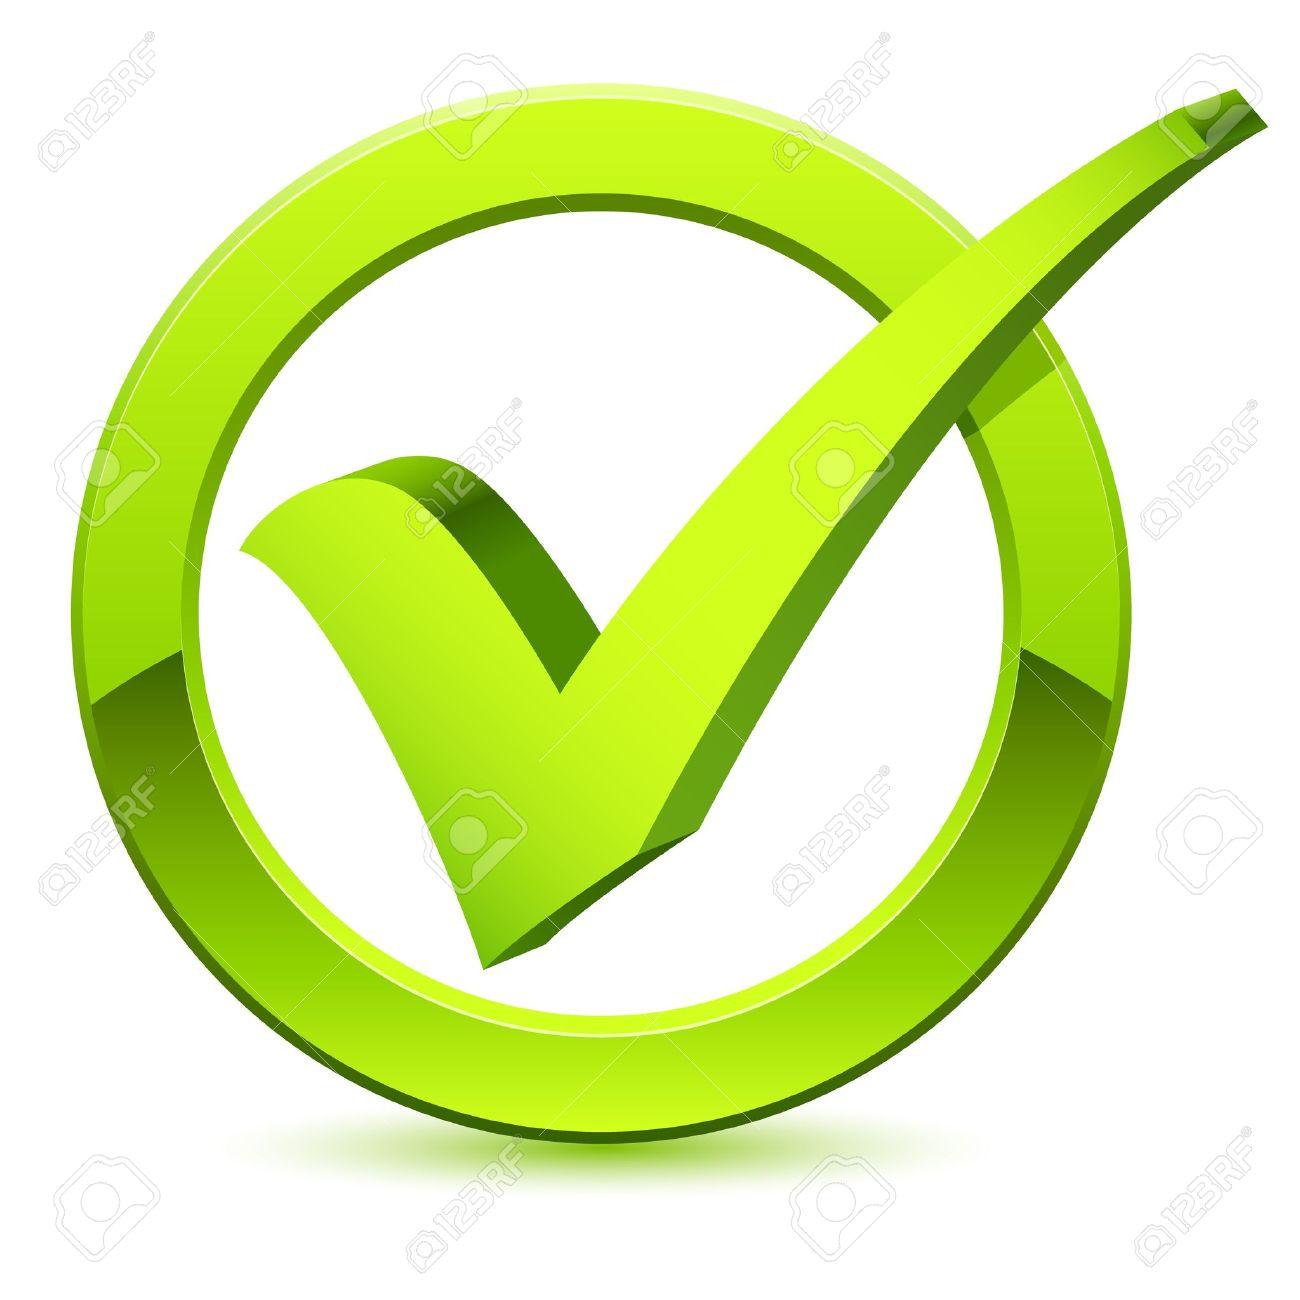 3d Check Mark Symbol Royalty Free Cliparts Vectors And Stock